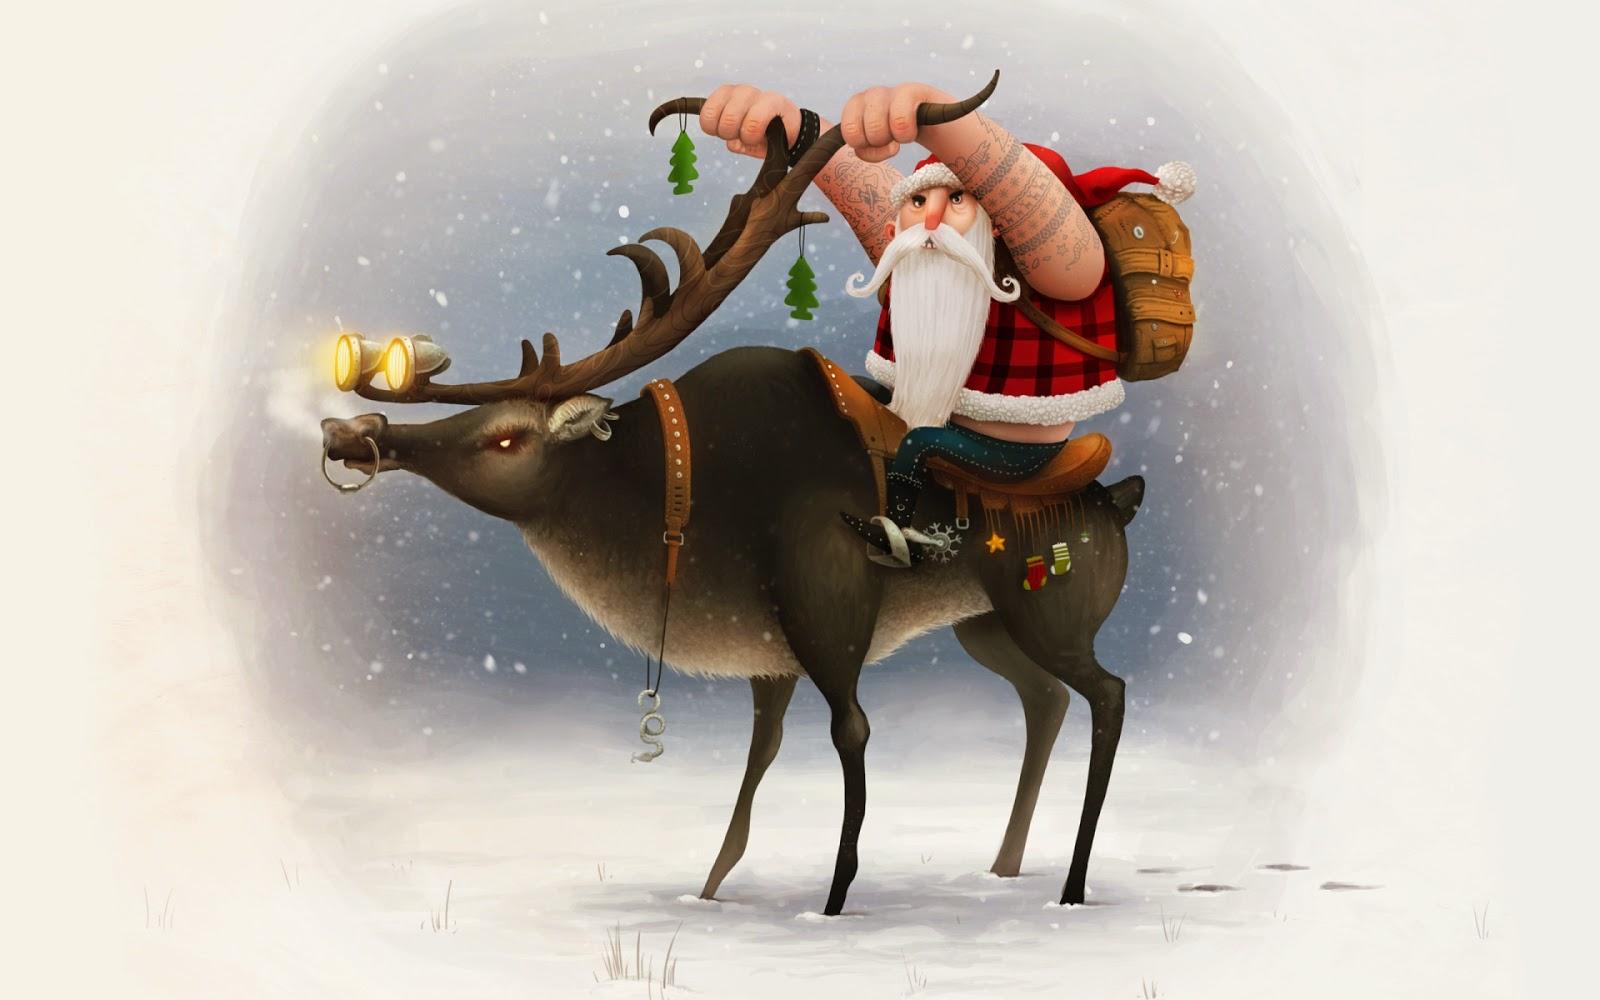 funny-Santa-claus-cartoon-images-for-kids.jpg